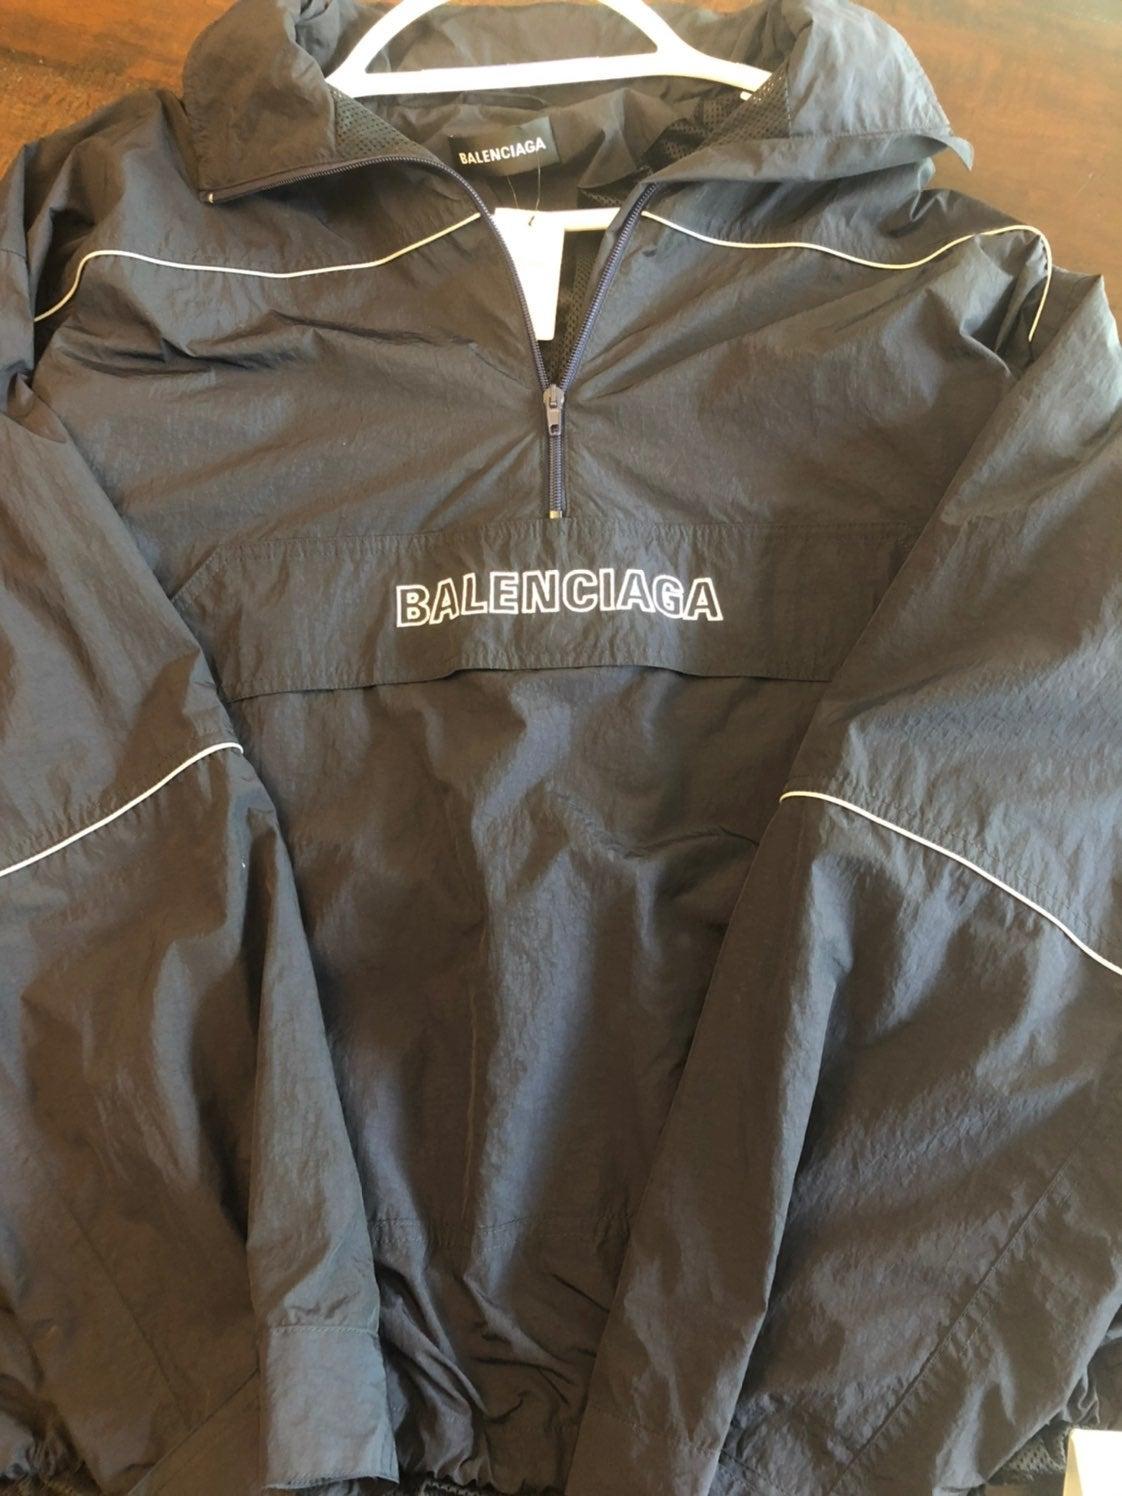 Balenciaga Windbreaker Brand New